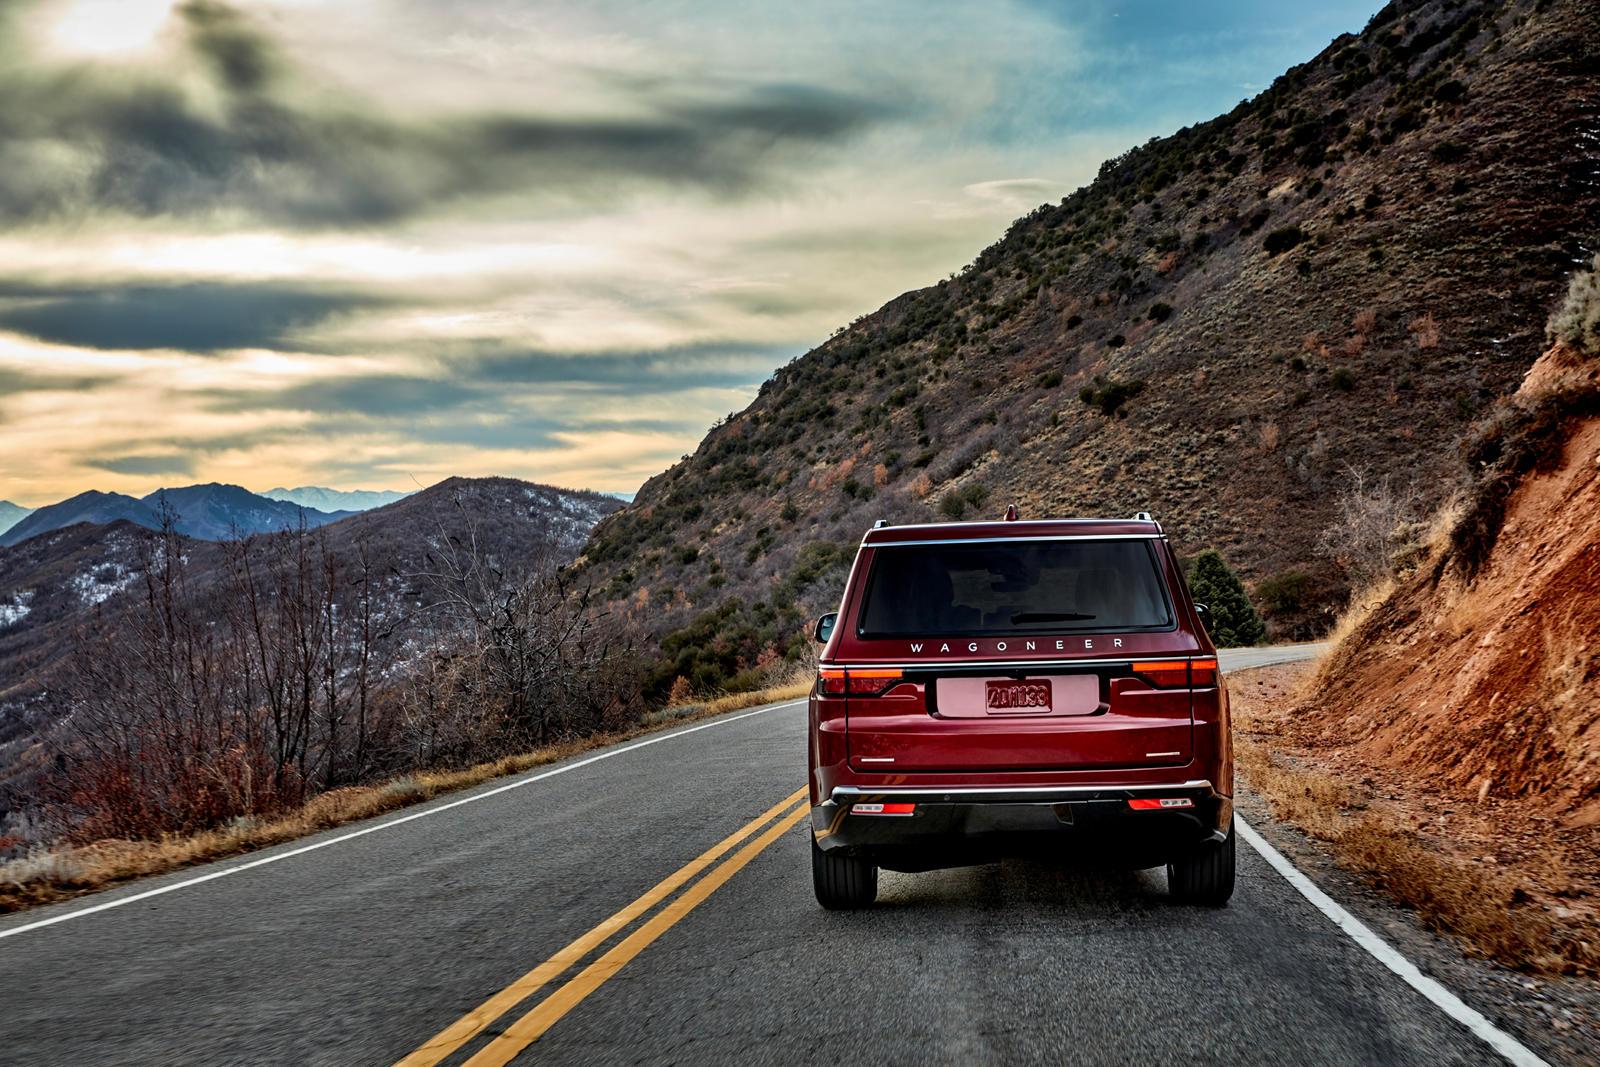 Jeep-Wagoneer-2022 (9).jpg